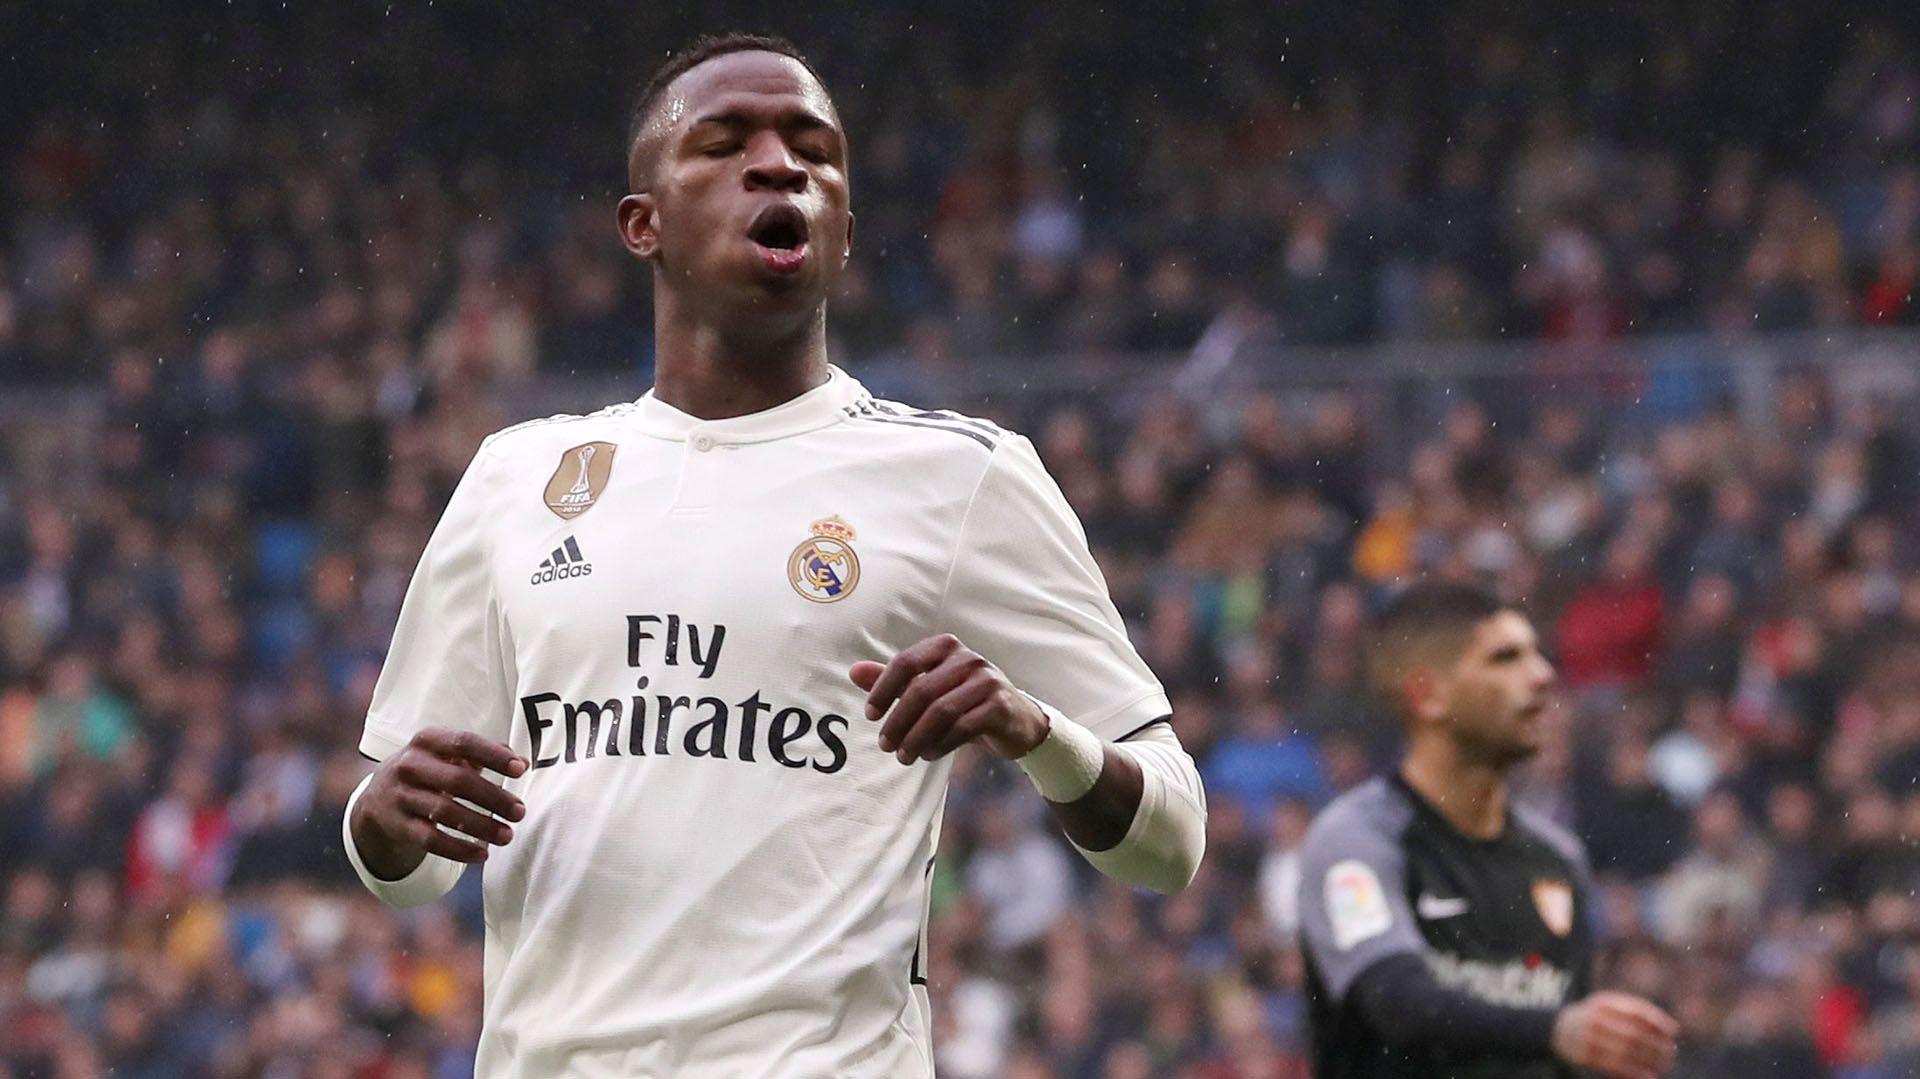 El brasileño Vinicius Junior (Real Madrid) USD 67,5 millones